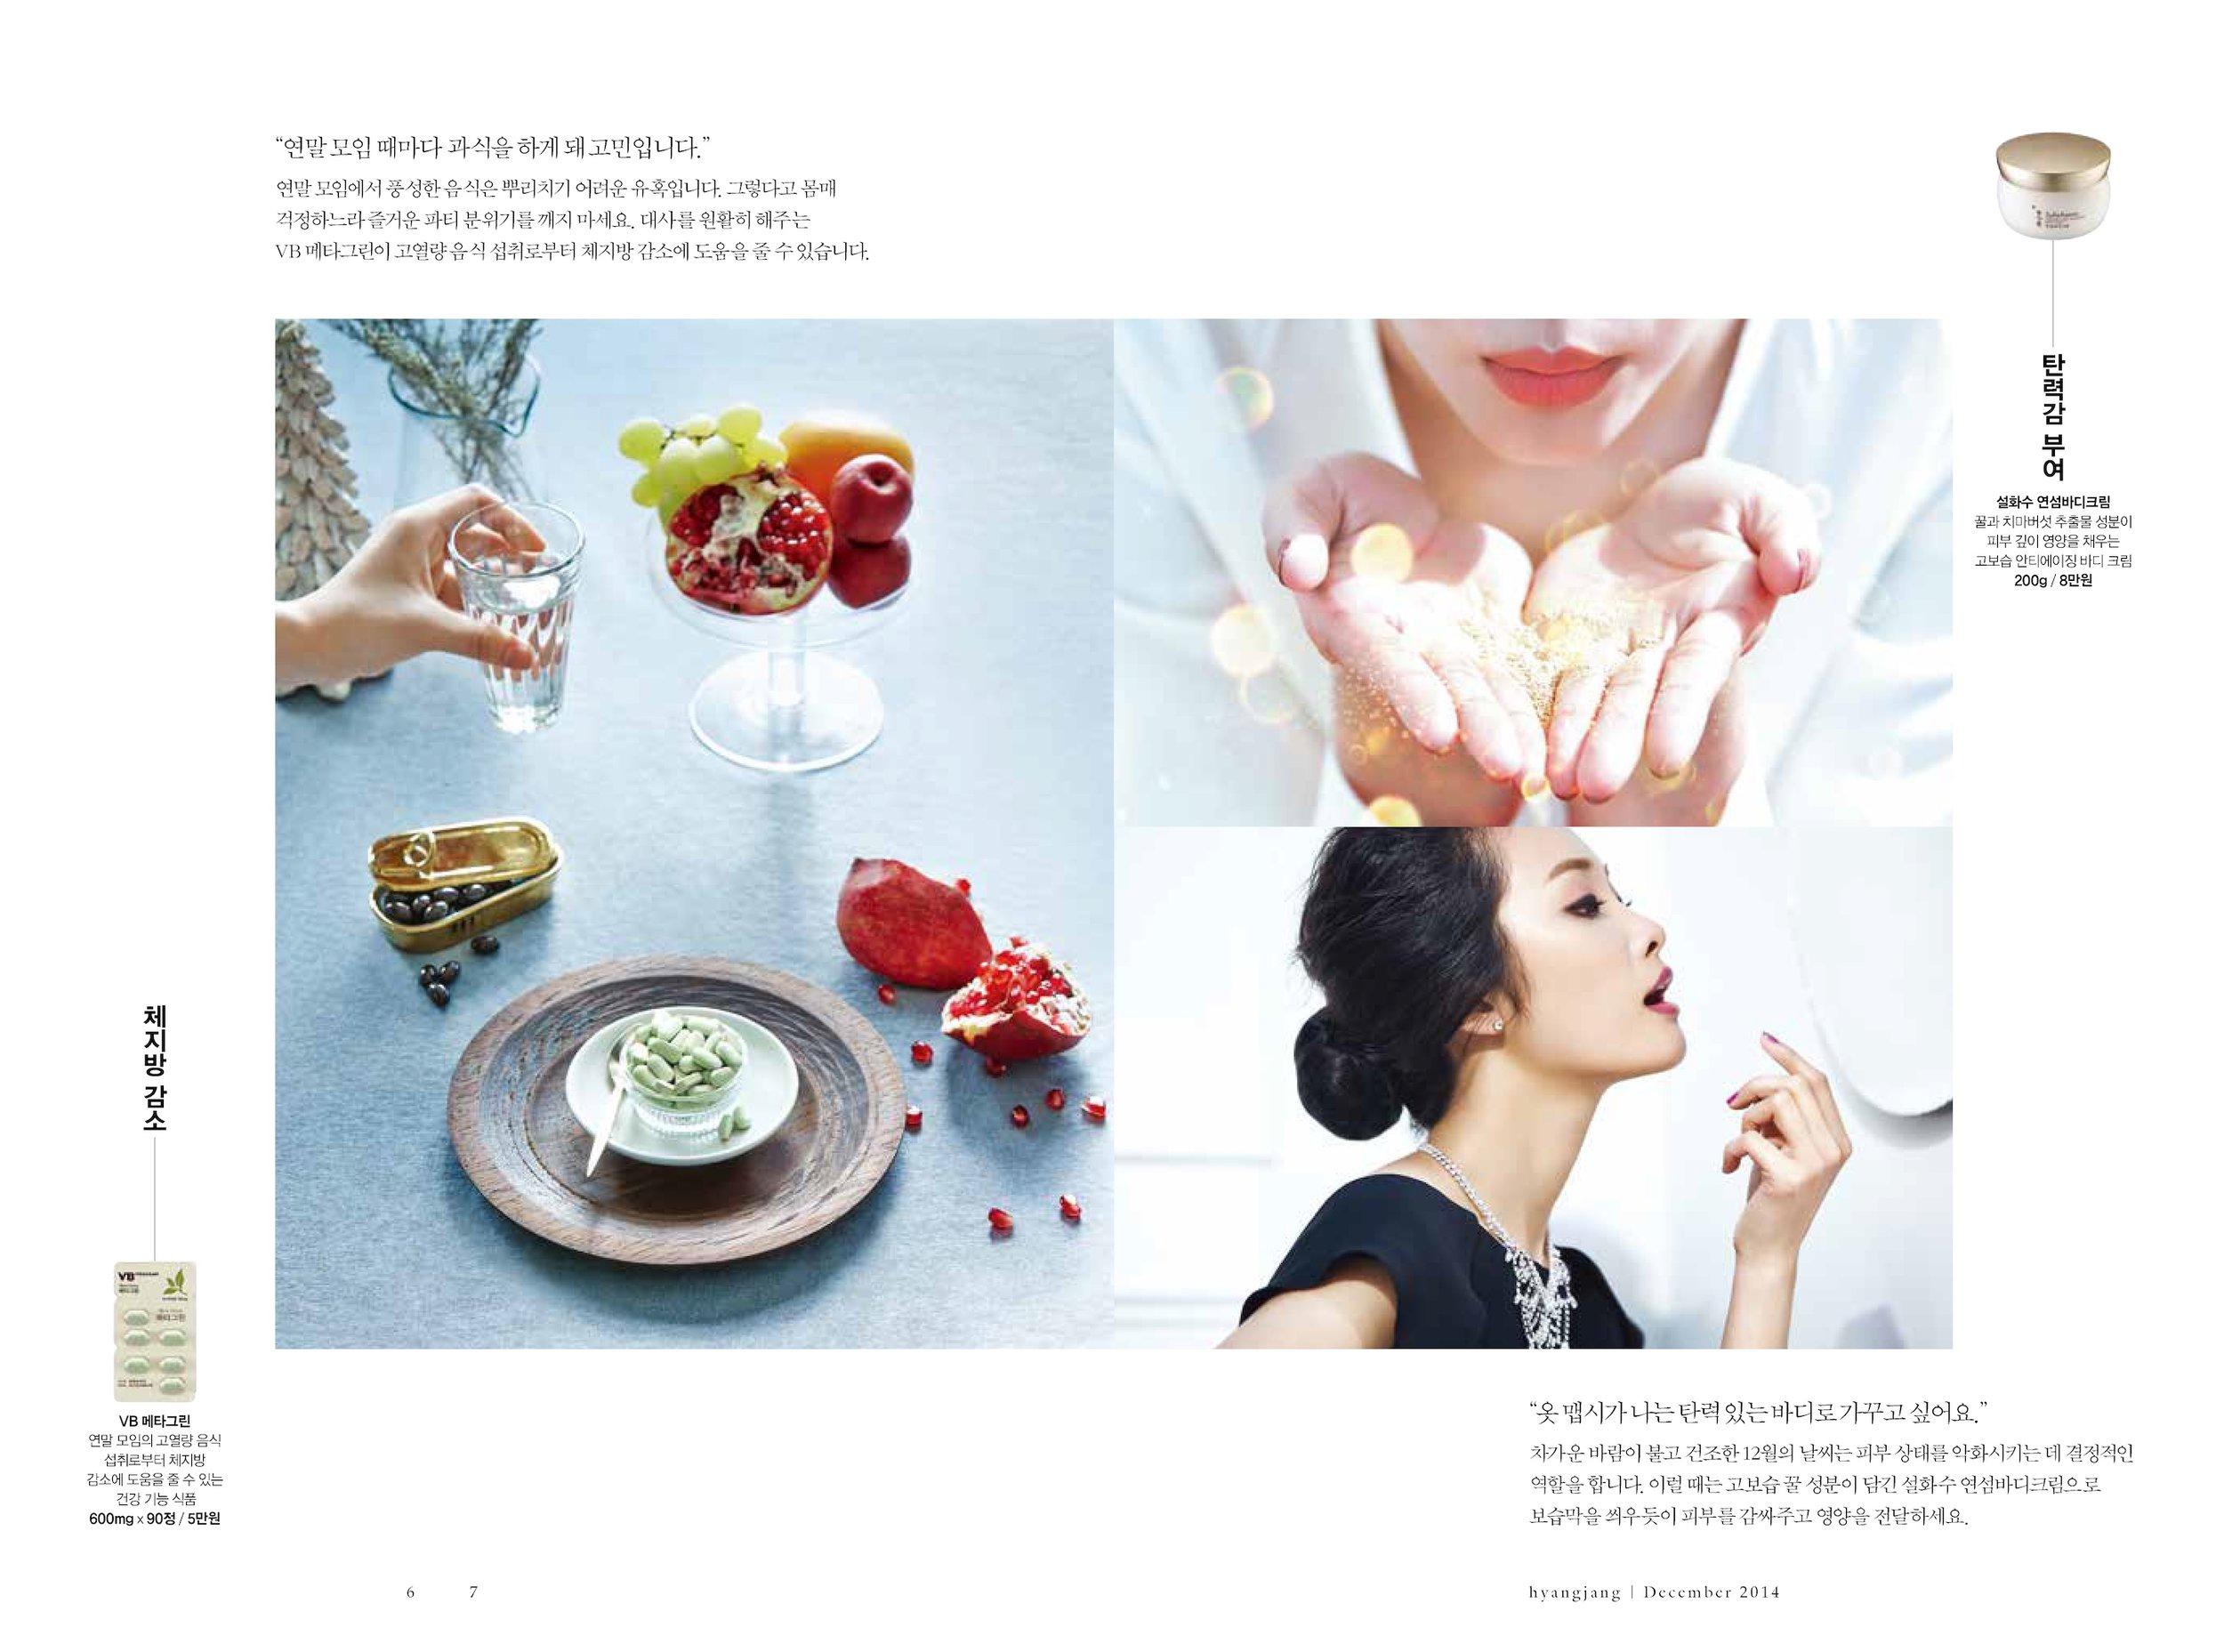 hyangjang-201412_페이지_05.jpeg